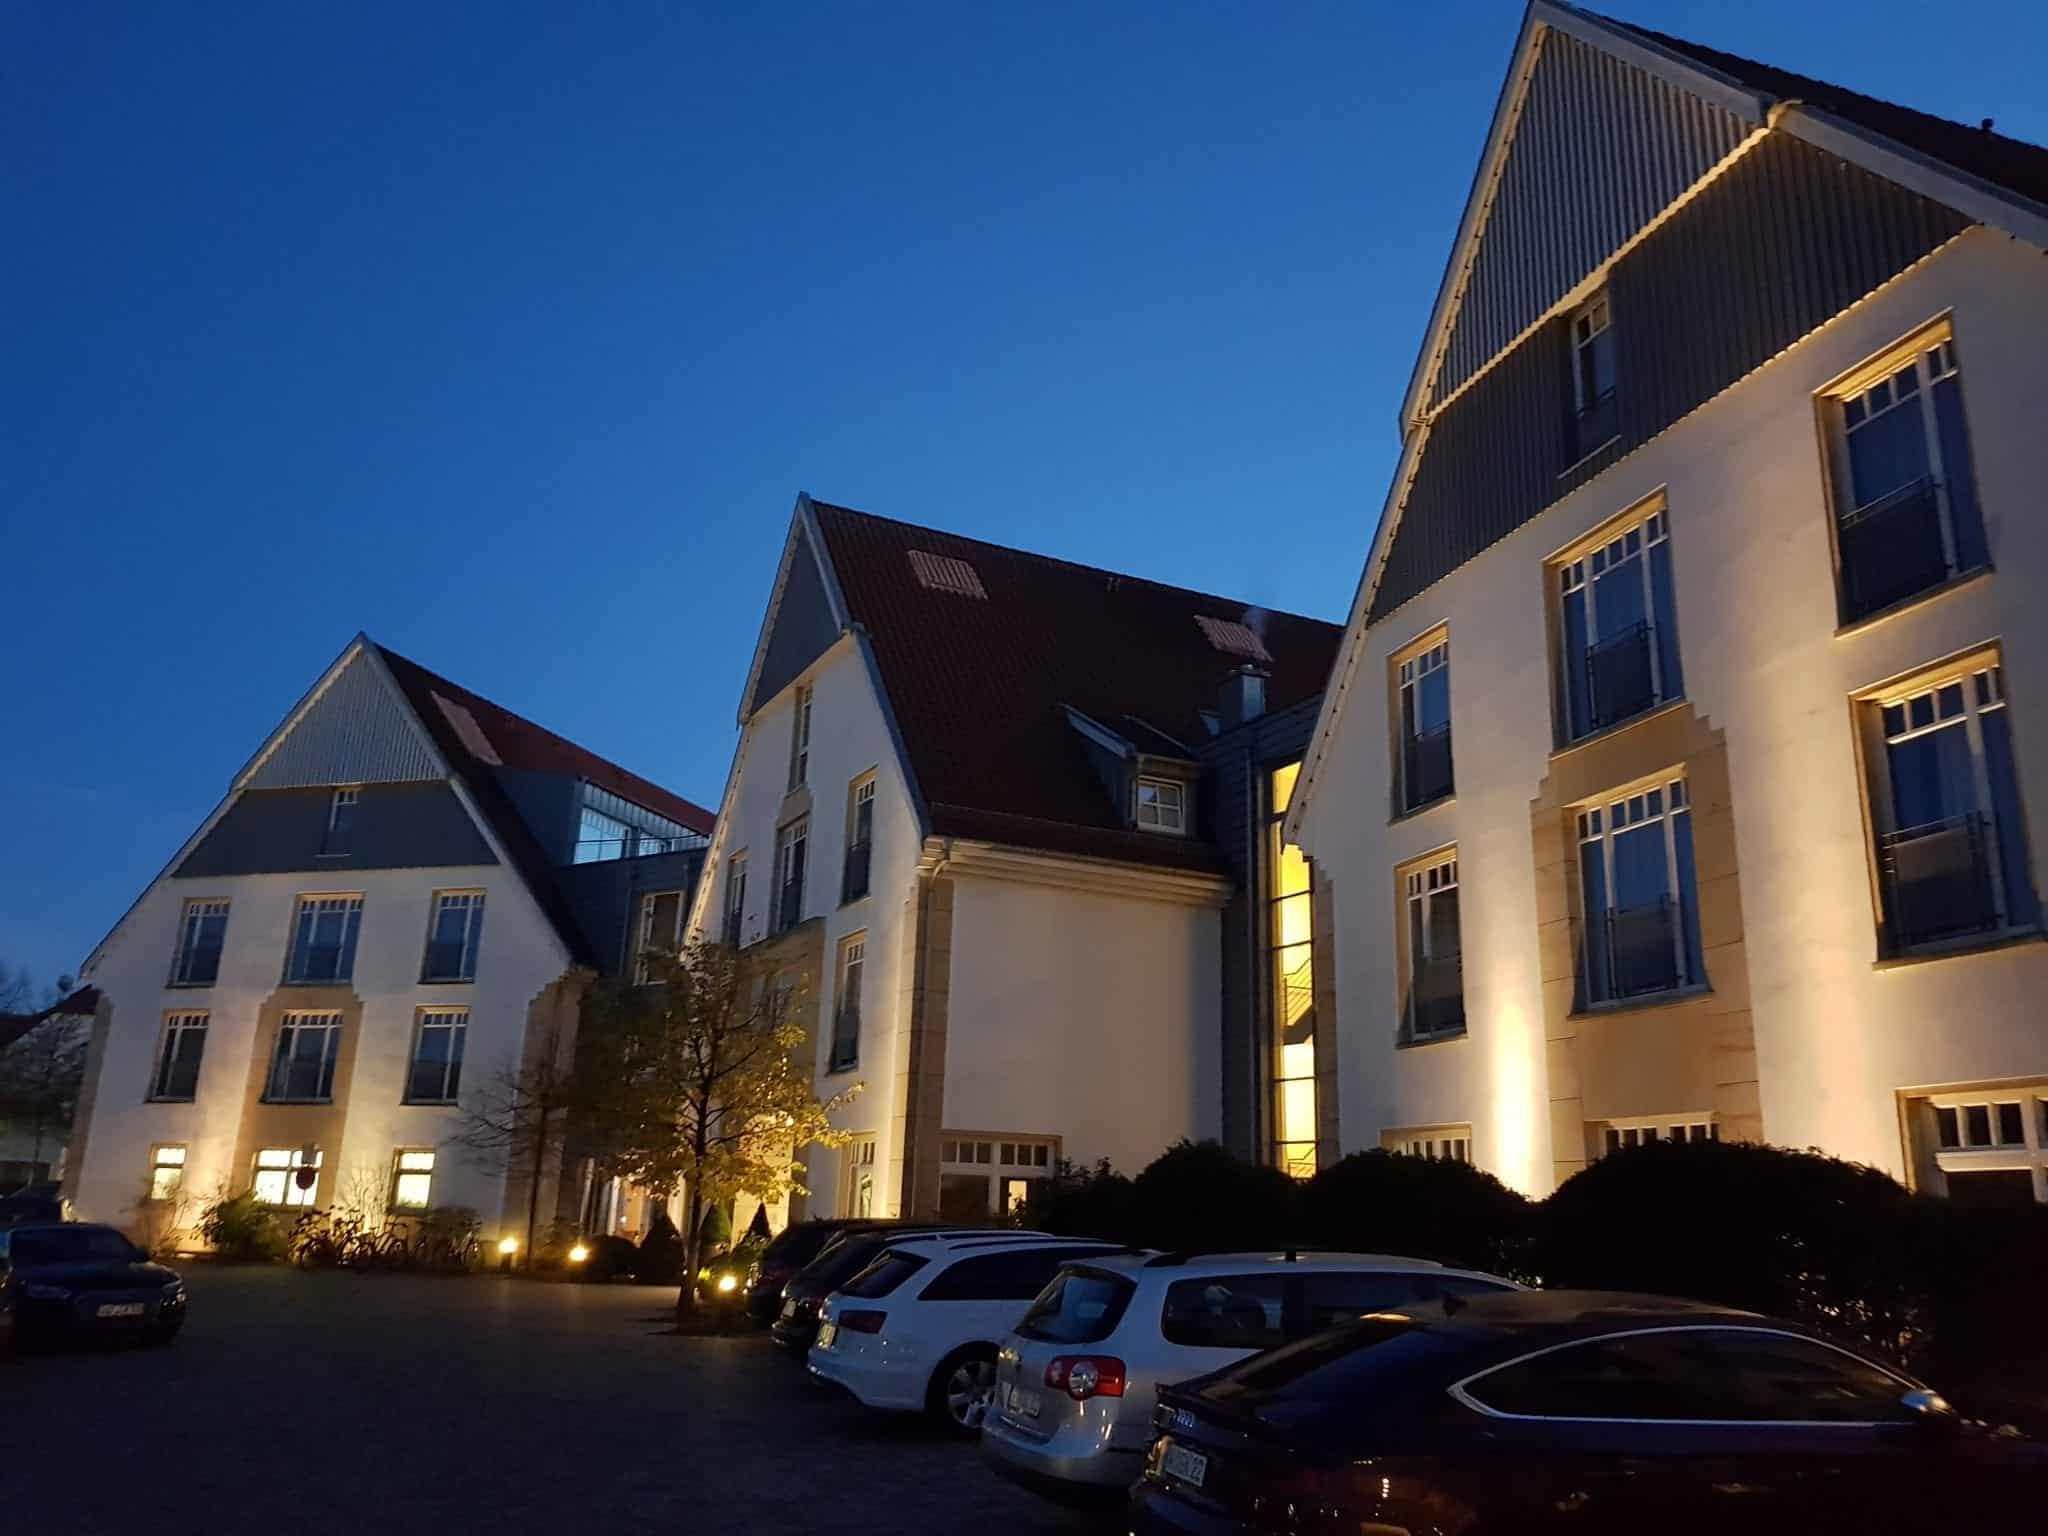 Hotel Lind Rietberg